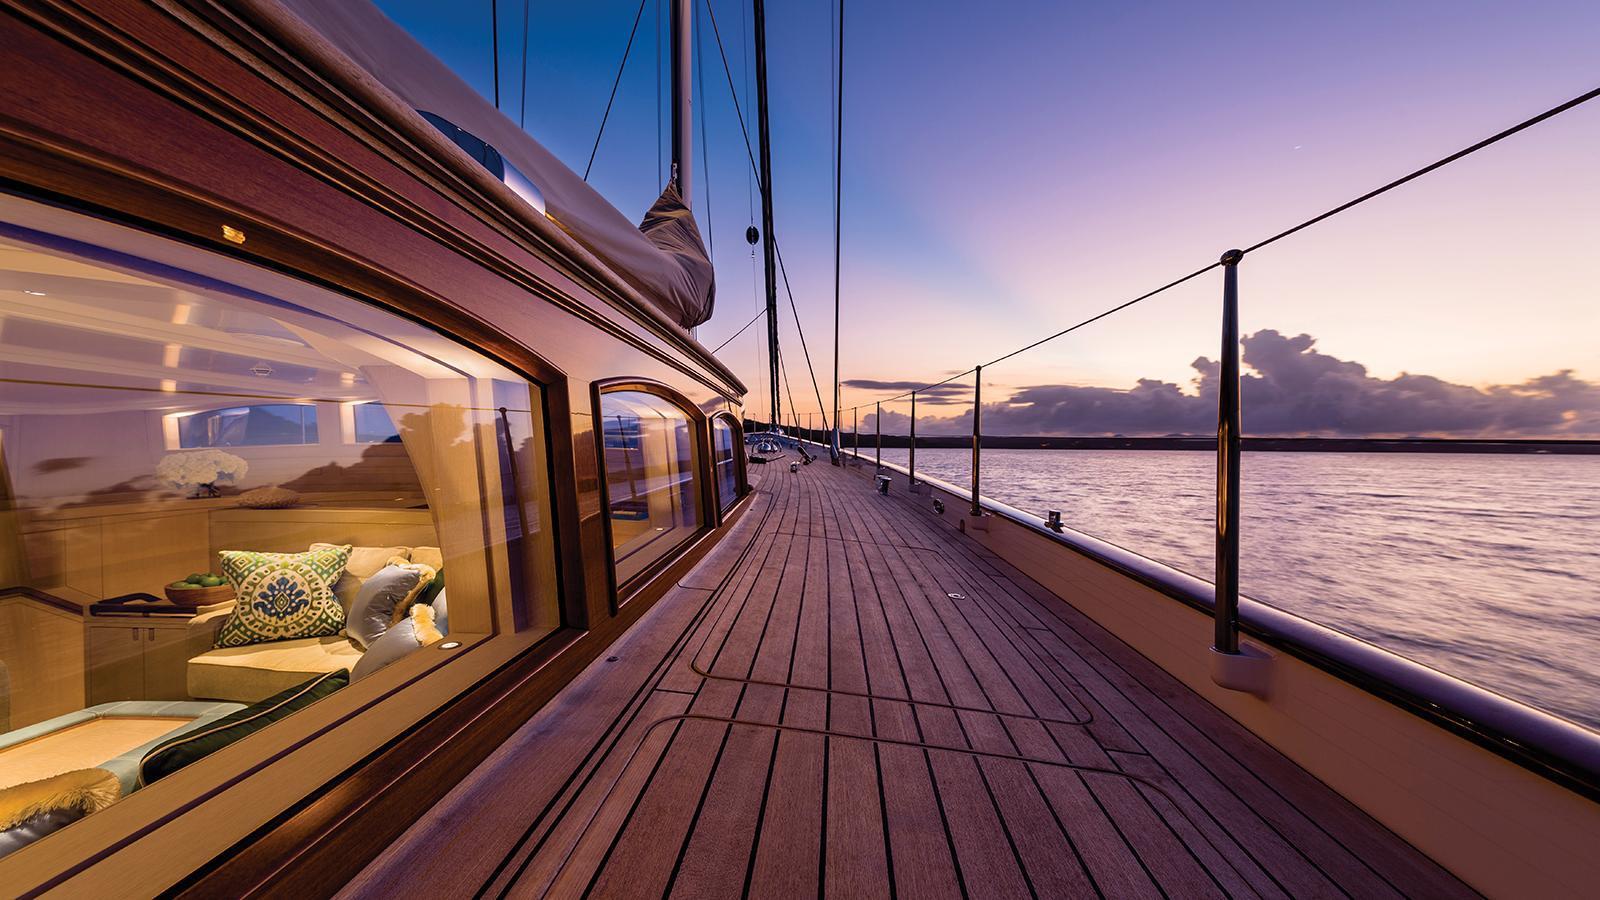 elfje-sailing-yacht-royal-huisman-2014-52m-deck